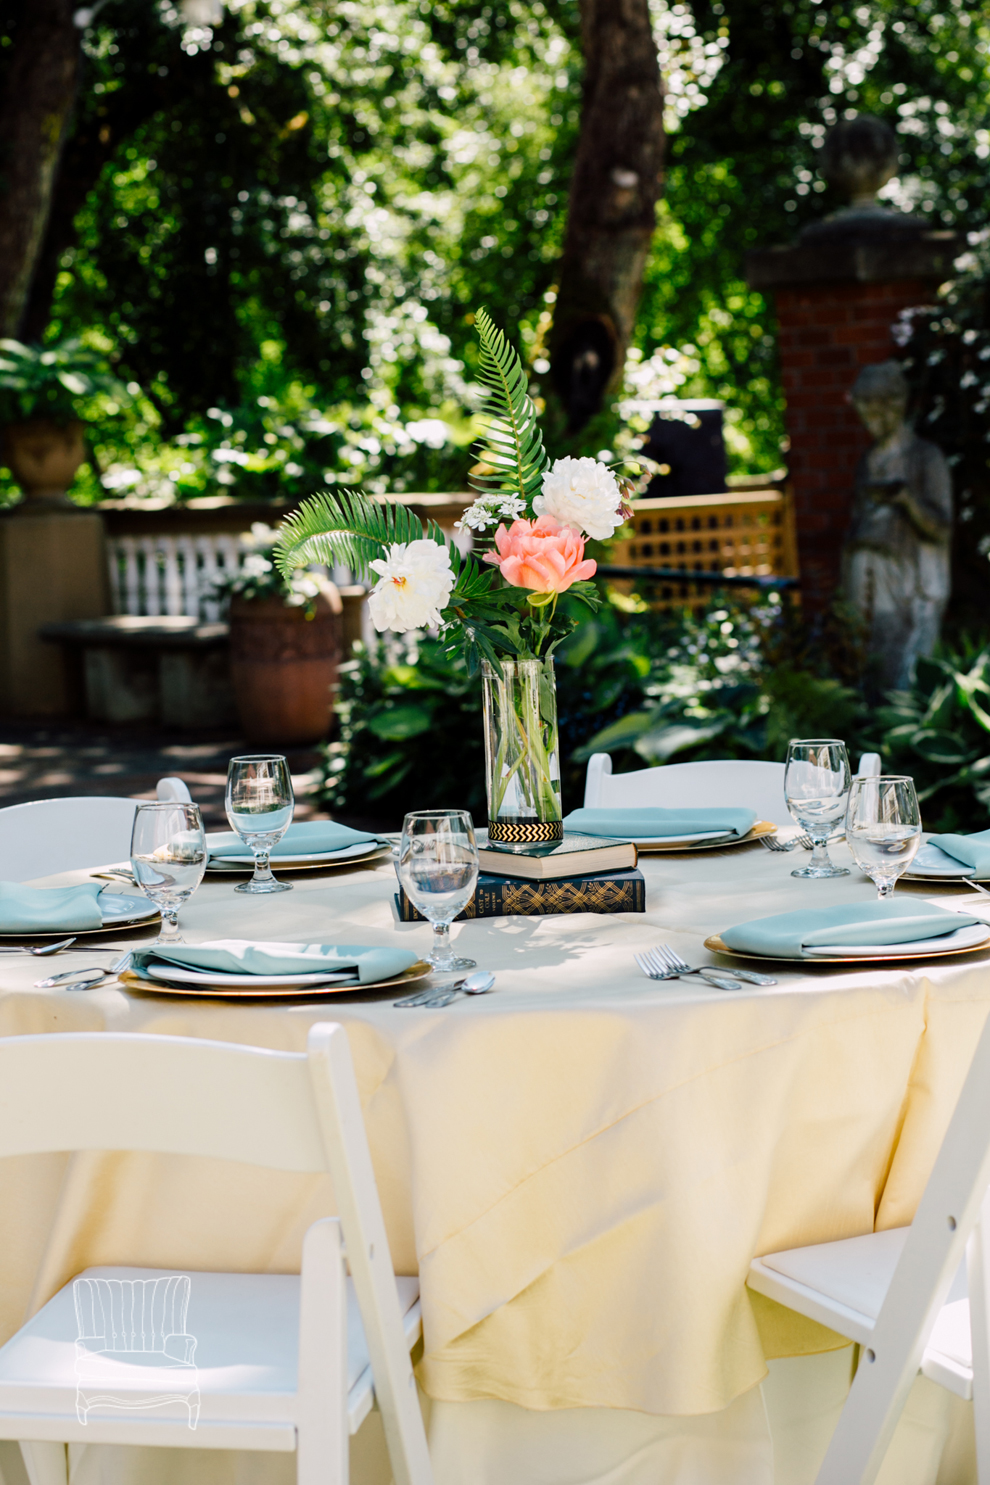 008-lairmont-manor-bellingham-washington-wedding-venue-katheryn-moran-photography-marketing.jpg